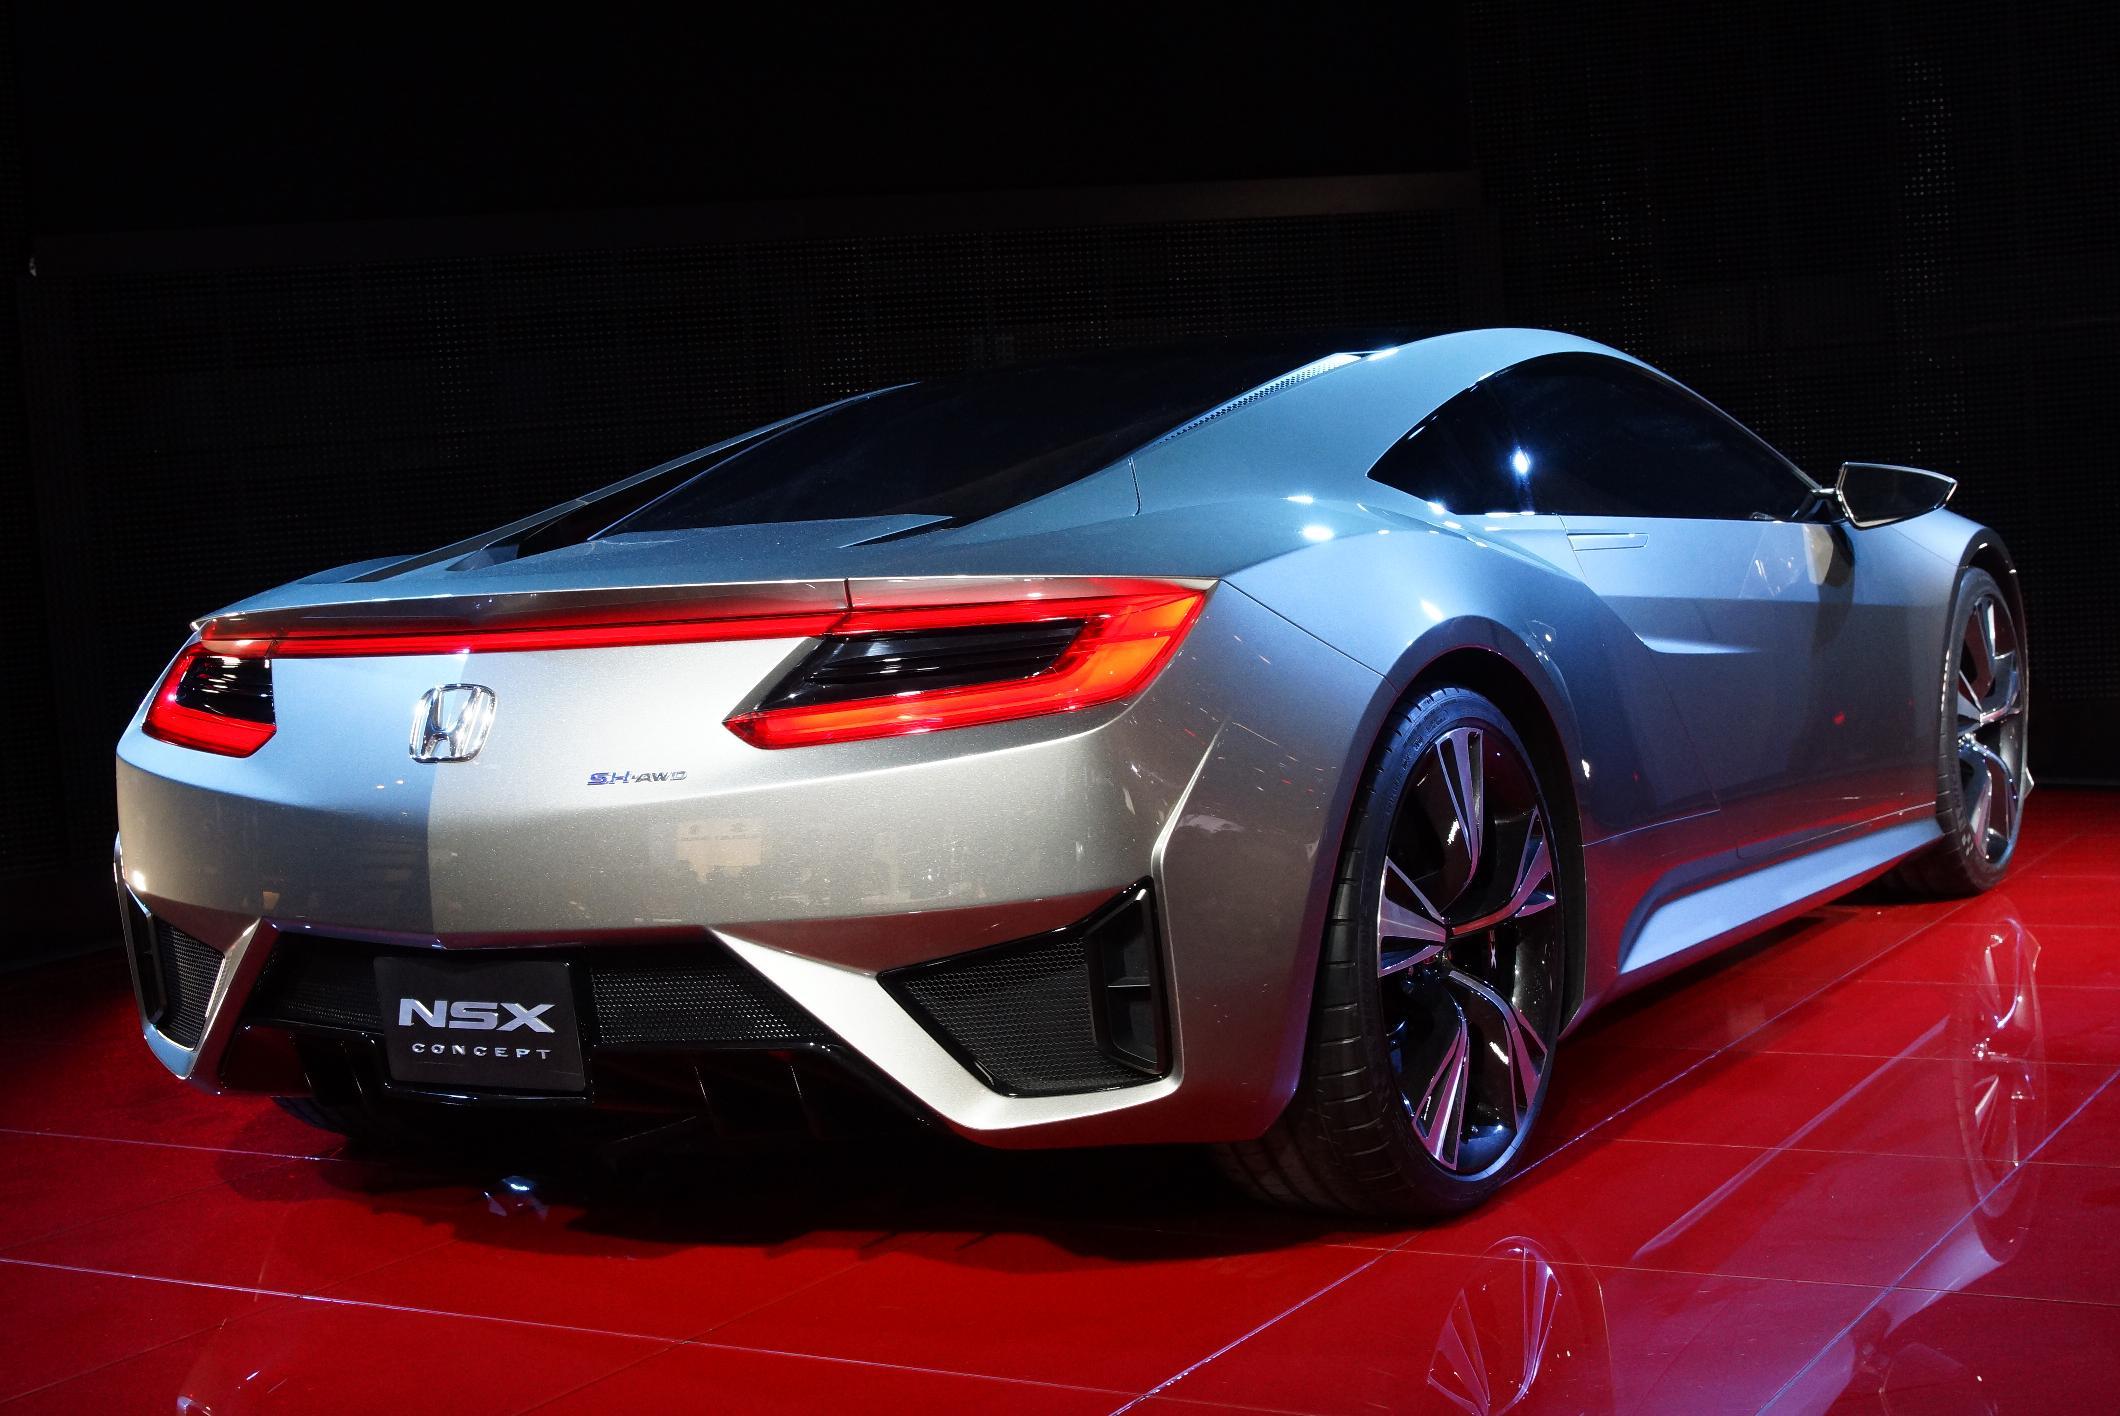 Honda NSX Geneva 2012 Rear